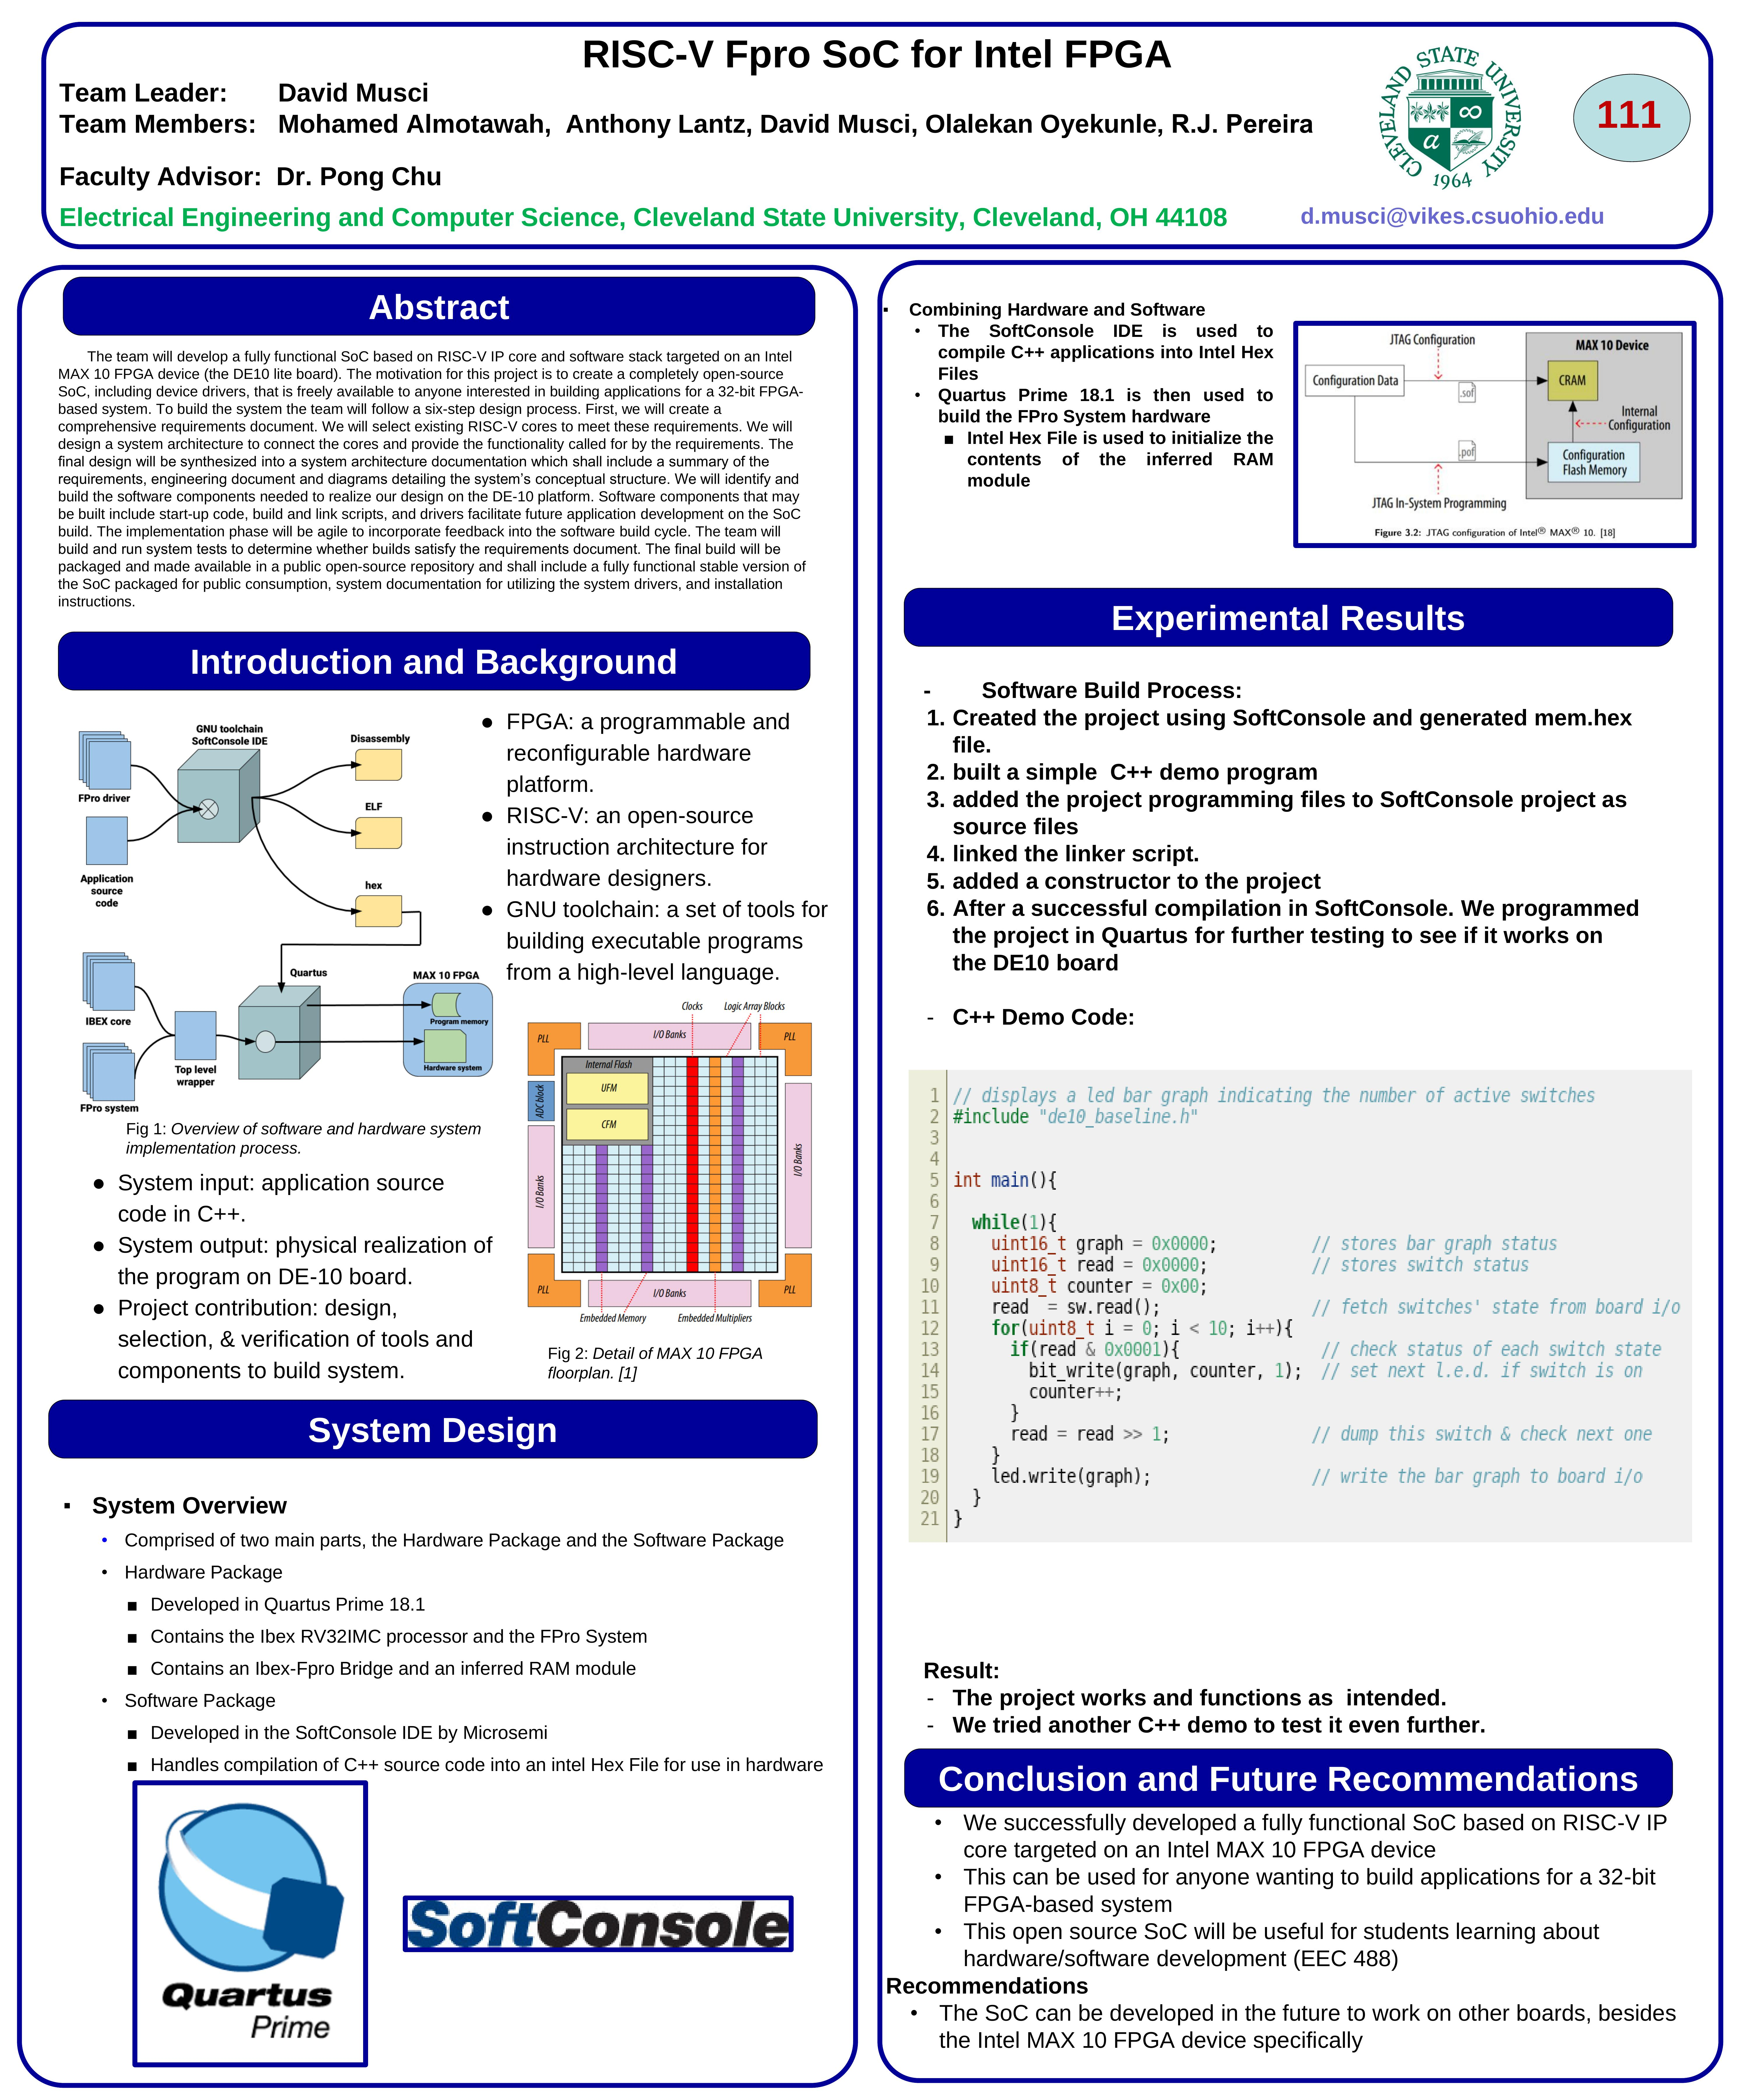 Team111_RISC-V Fpro SoC for Intel FPGA